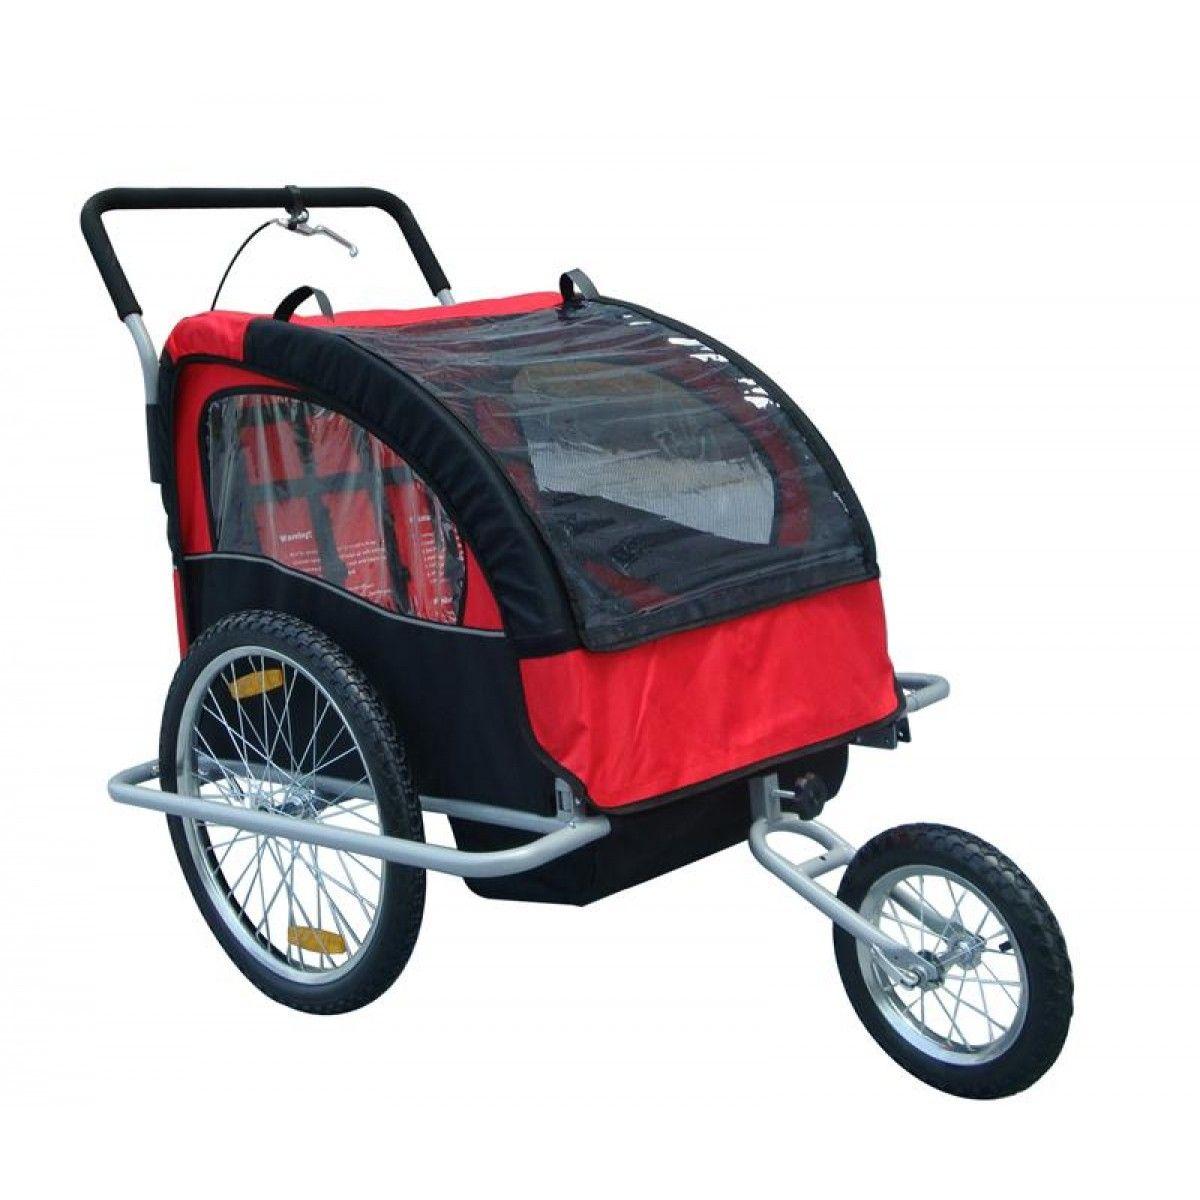 Double Stroller Bike Trailer The Elite 2in1 Double Child